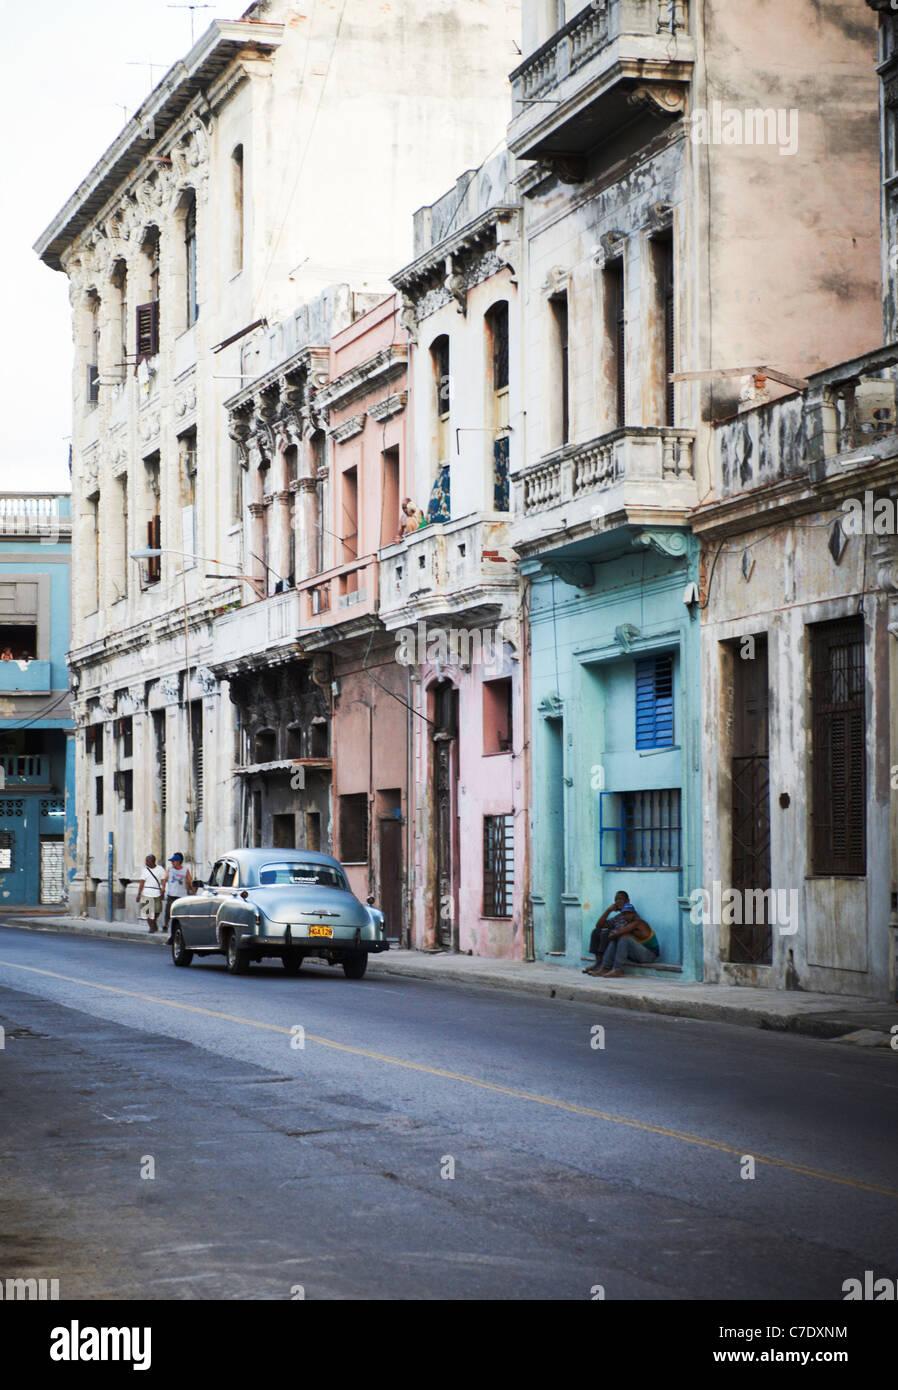 Escena de una calle de La Habana Cuba Imagen De Stock